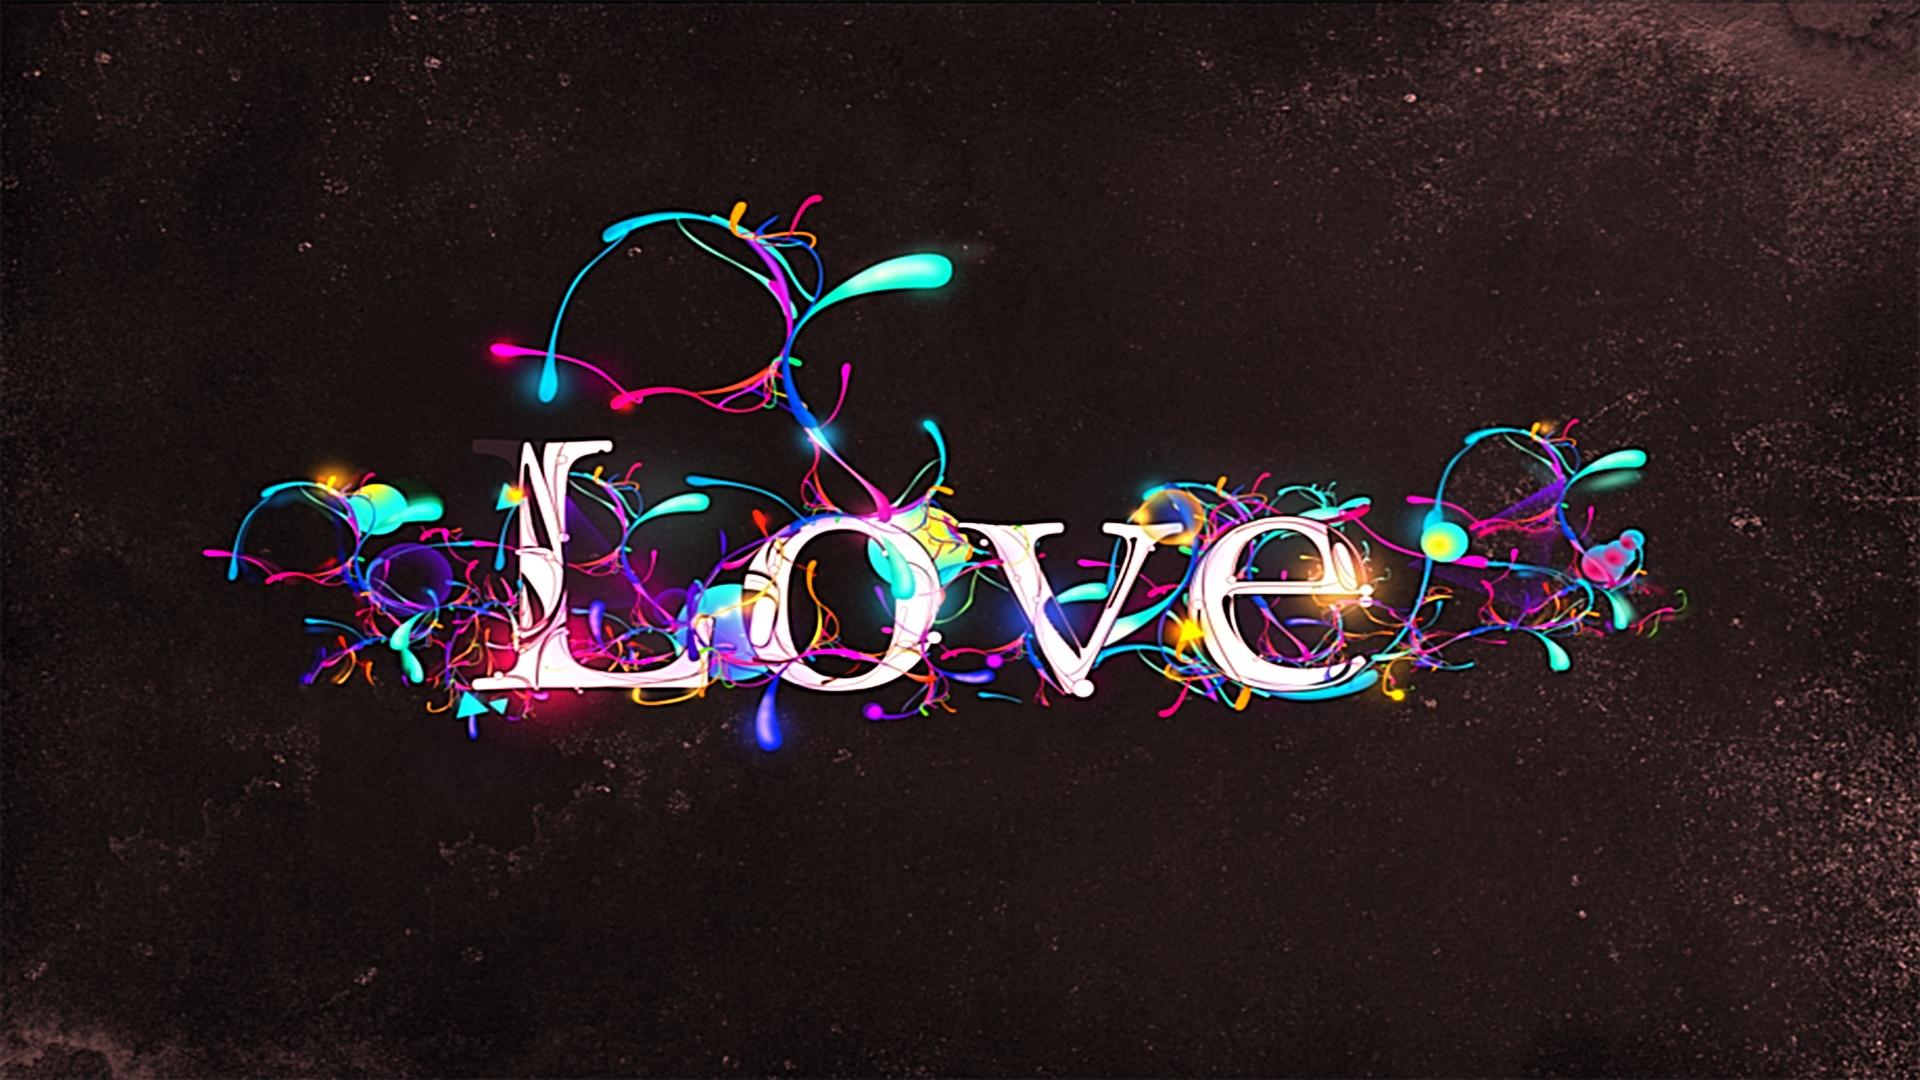 Download Artistic Love Wallpaper 1920x1080 Wallpoper 218621 1920x1080